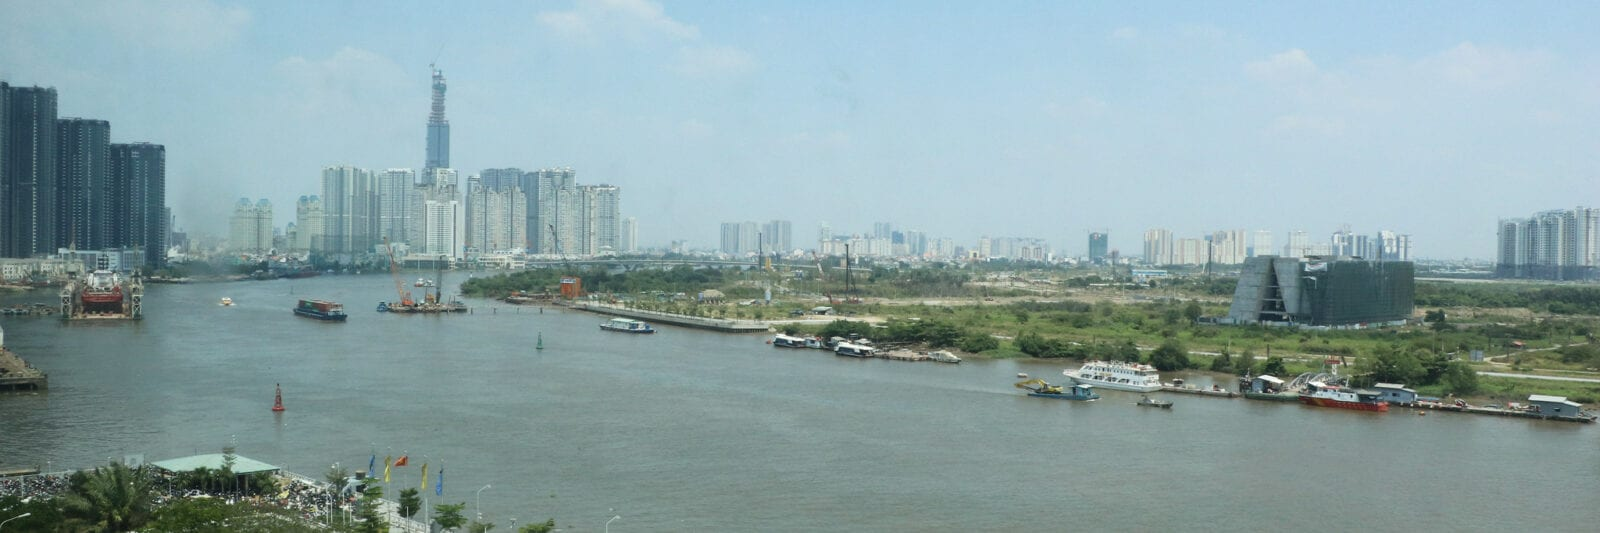 Image of the Saigon River in HCMC, Vietnam